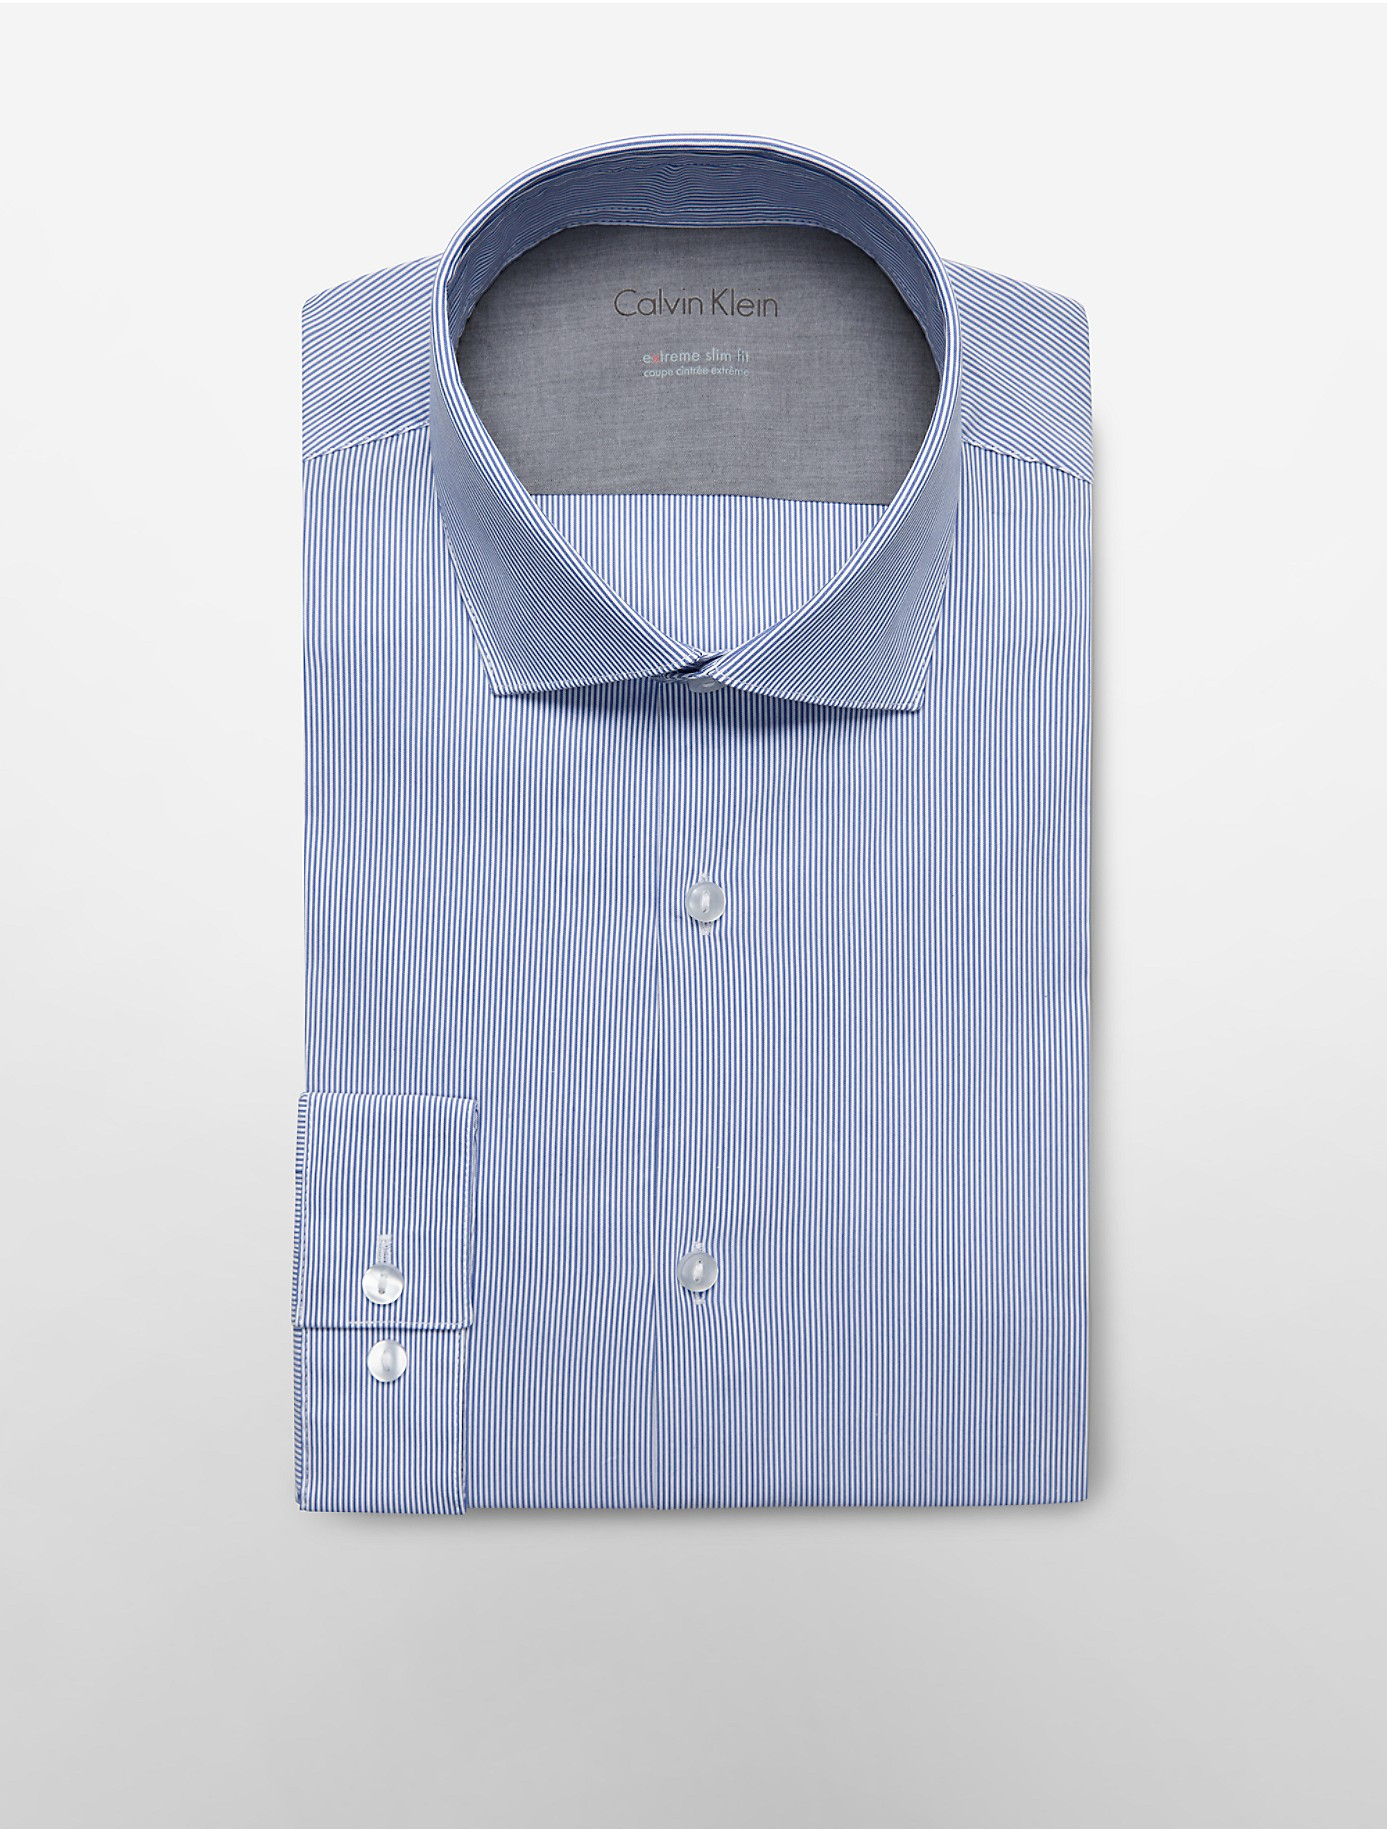 Lyst calvin klein white label x fit ultra slim fit for Calvin klein x fit dress shirt